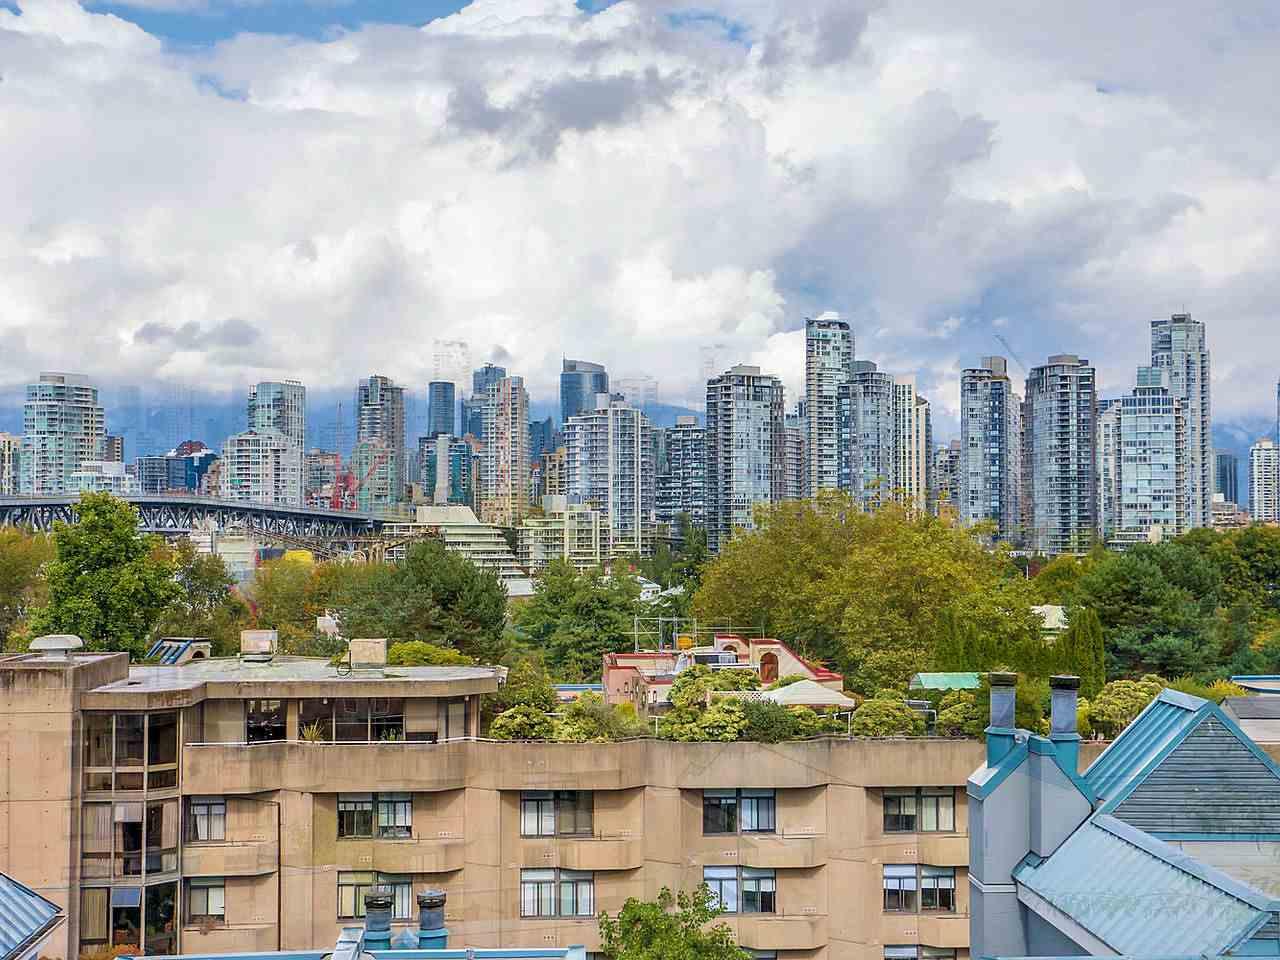 307 1355 W 4TH AVENUE, Vancouver, BC, V6H 3Y8 Primary Photo